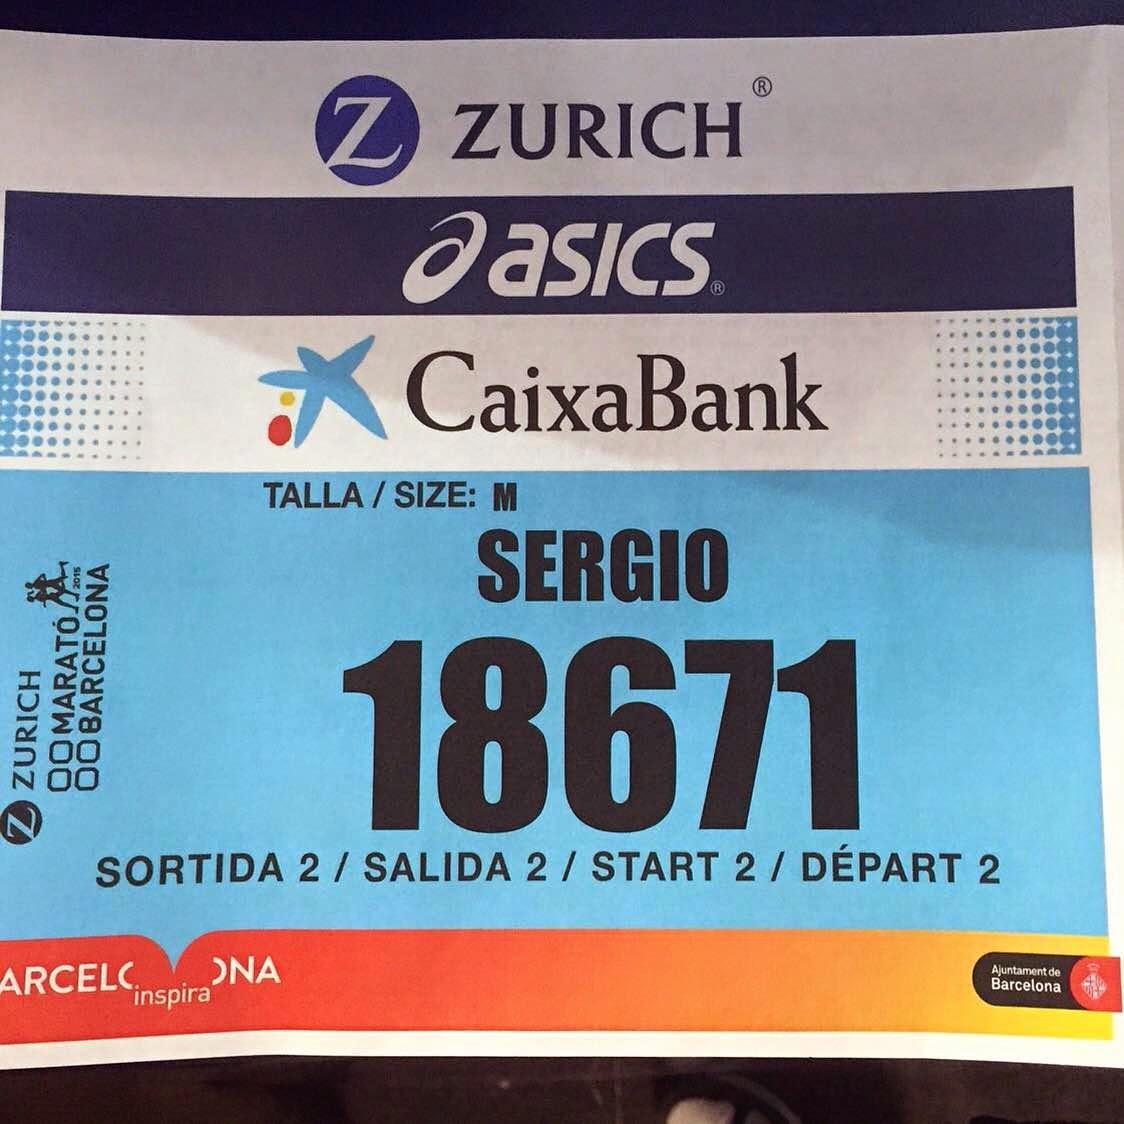 zurich marato de barcelona 2015 dorsal